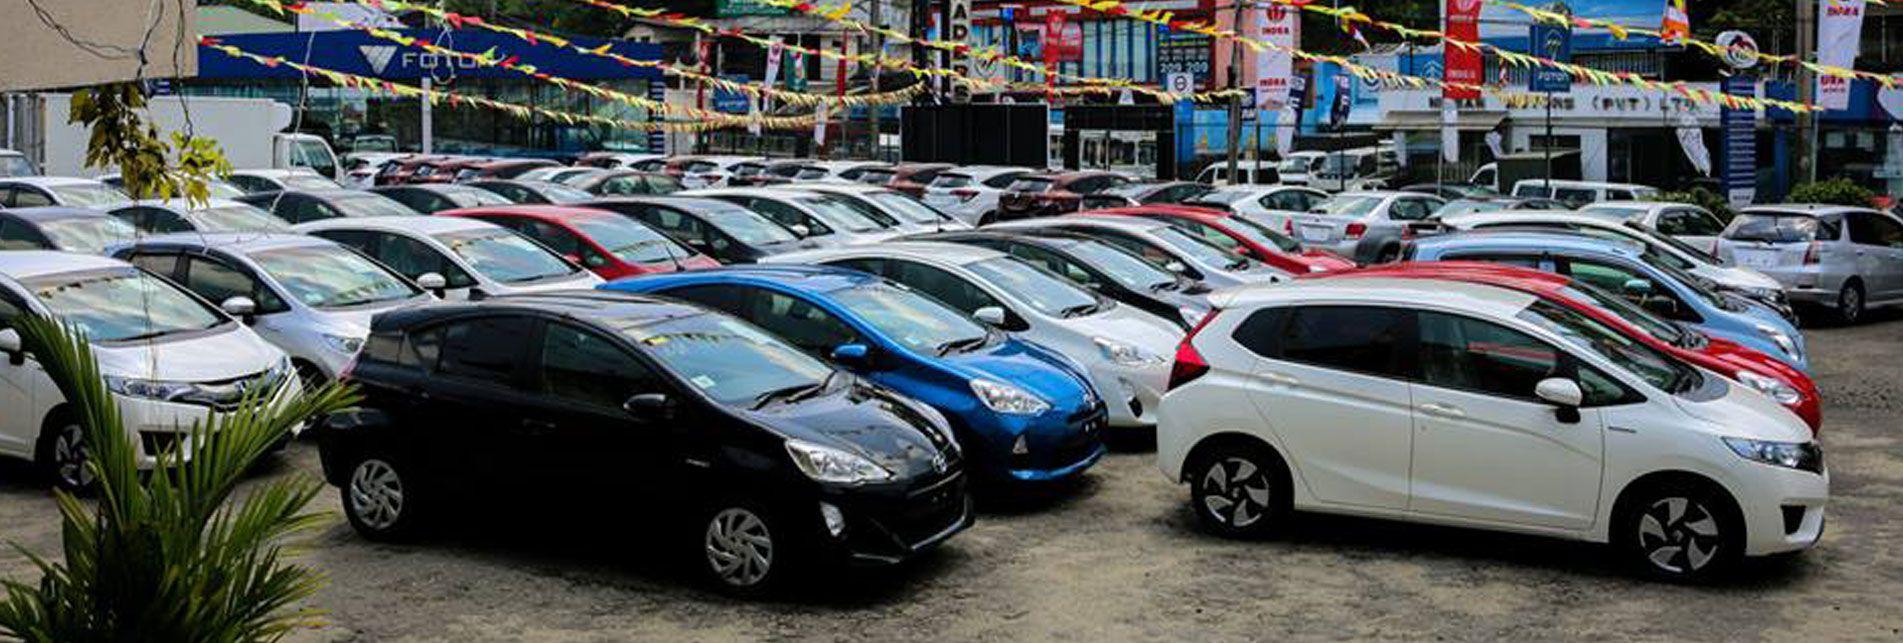 car sales sri lanka motor vehicles Pinterest Sri